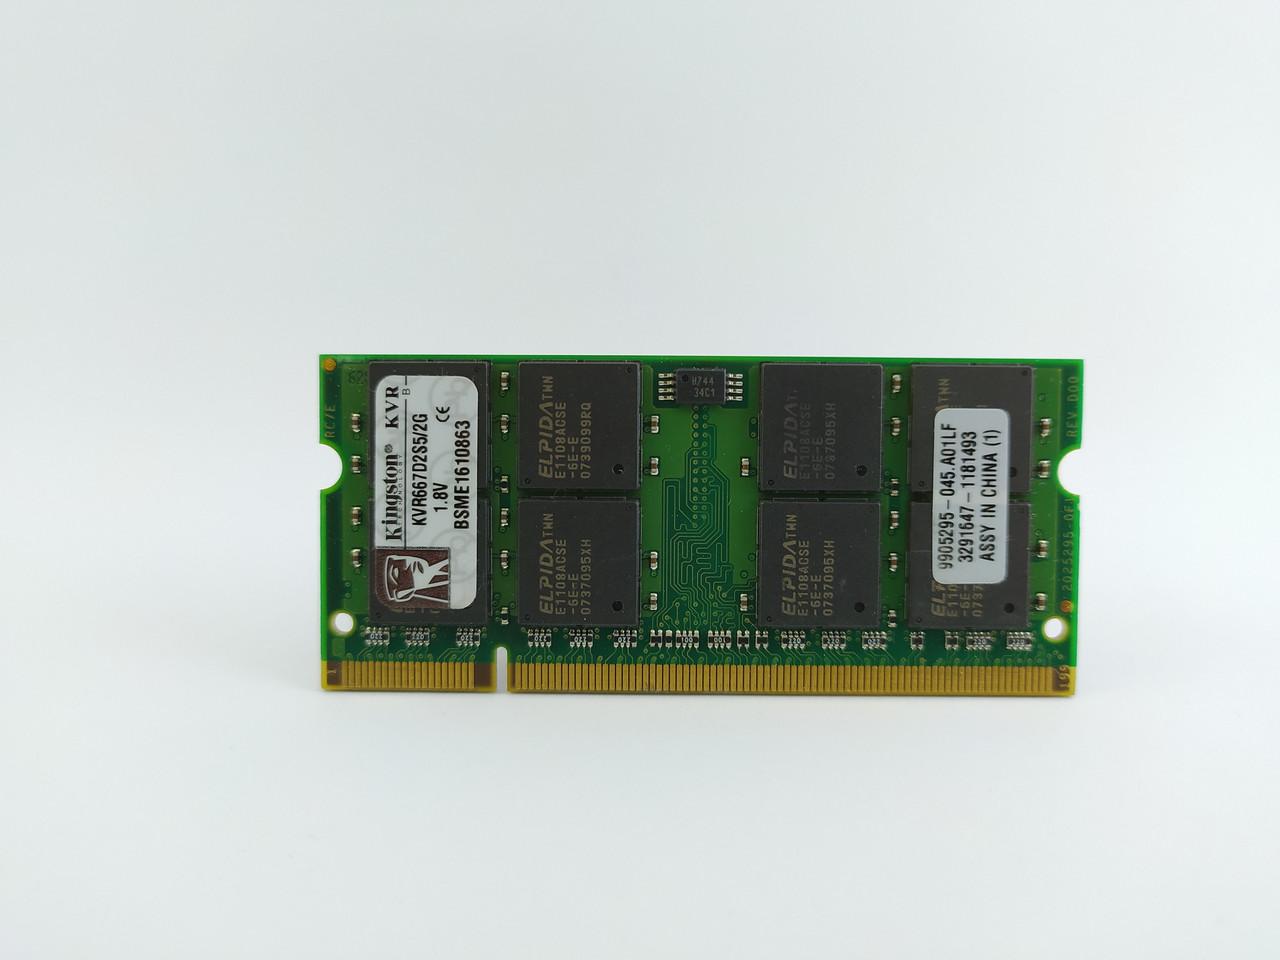 Оперативная память для ноутбука SODIMM Kingston DDR2 2Gb 667MHz PC2-5300S (KVR667D2S5/2G) Б/У